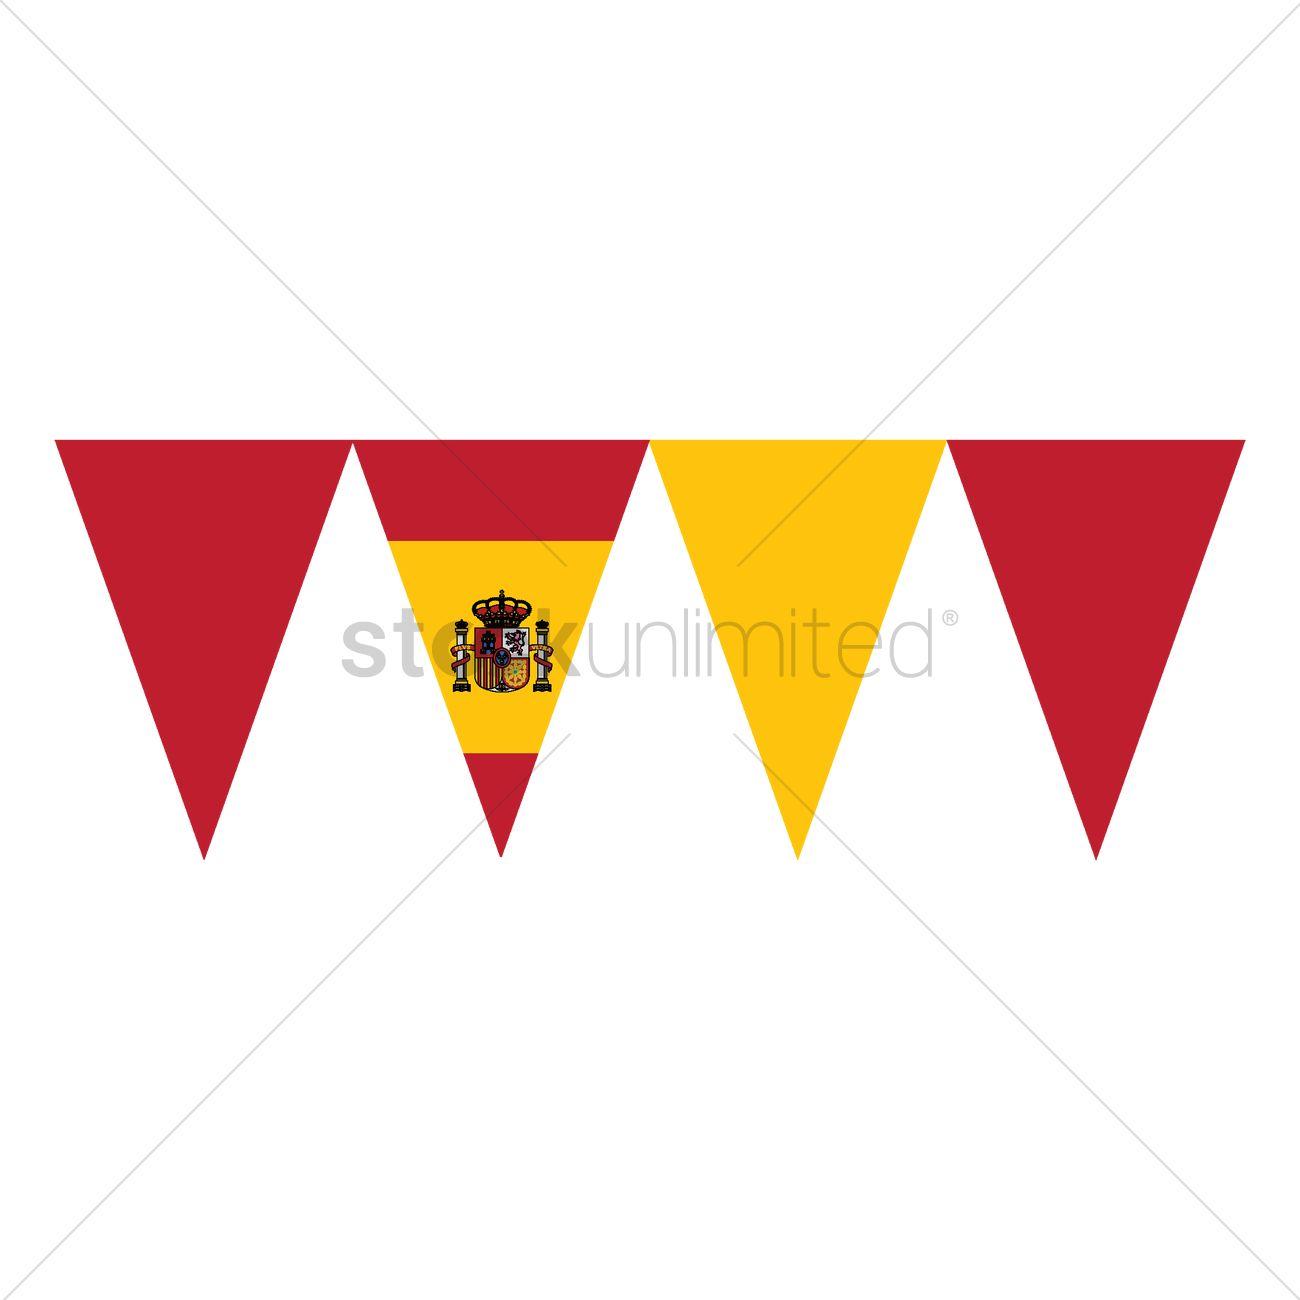 spain flag buntings vector image 1565301 stockunlimited